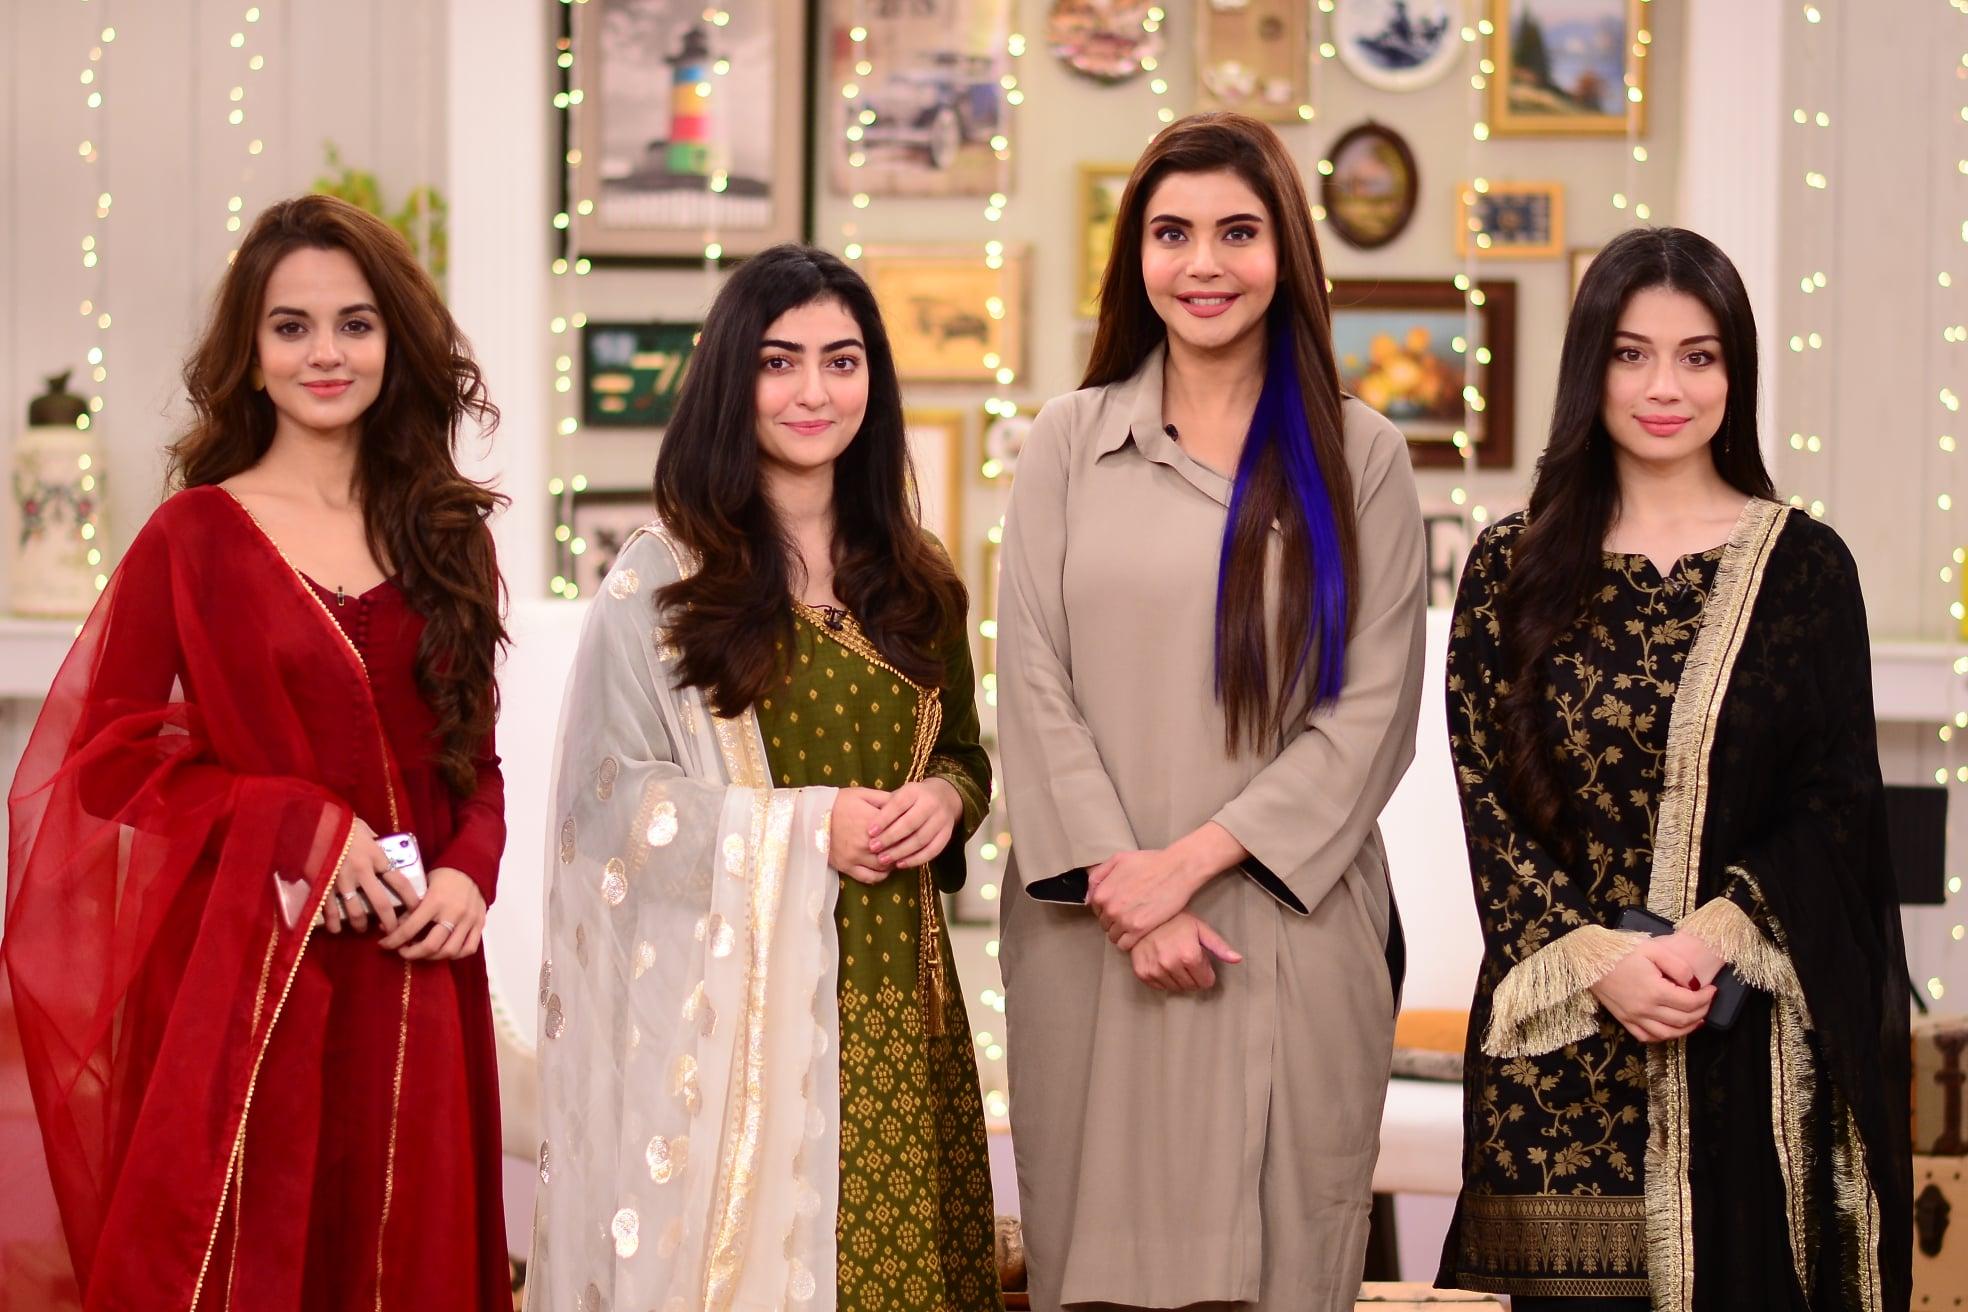 Maha Hasan, Sidra Batool and Komal Meer Pictures from GMP